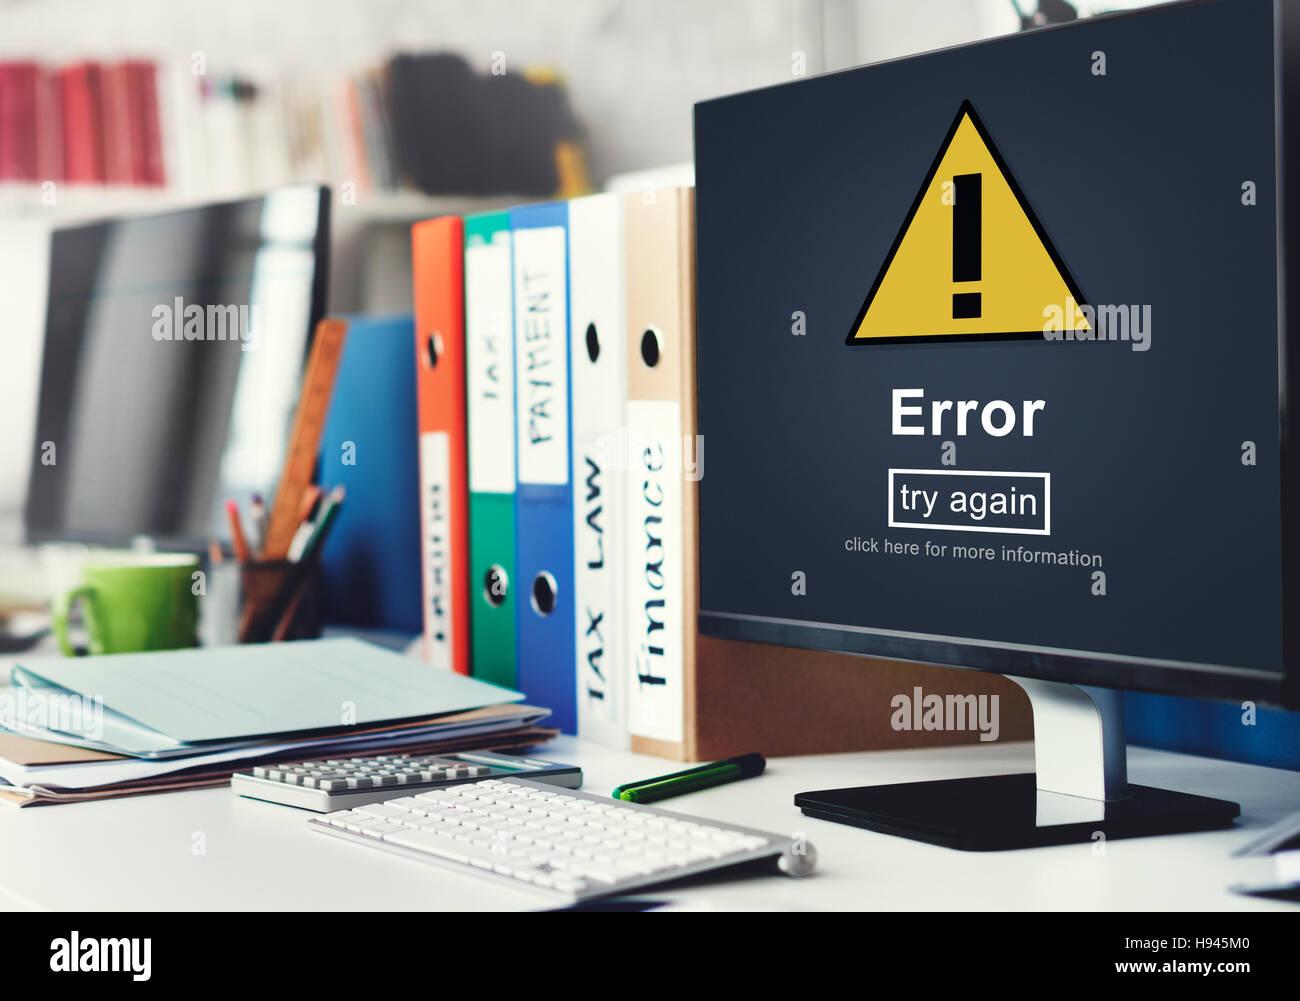 Error Mistake Online Reminder Beware Alert Concept - Stock Image